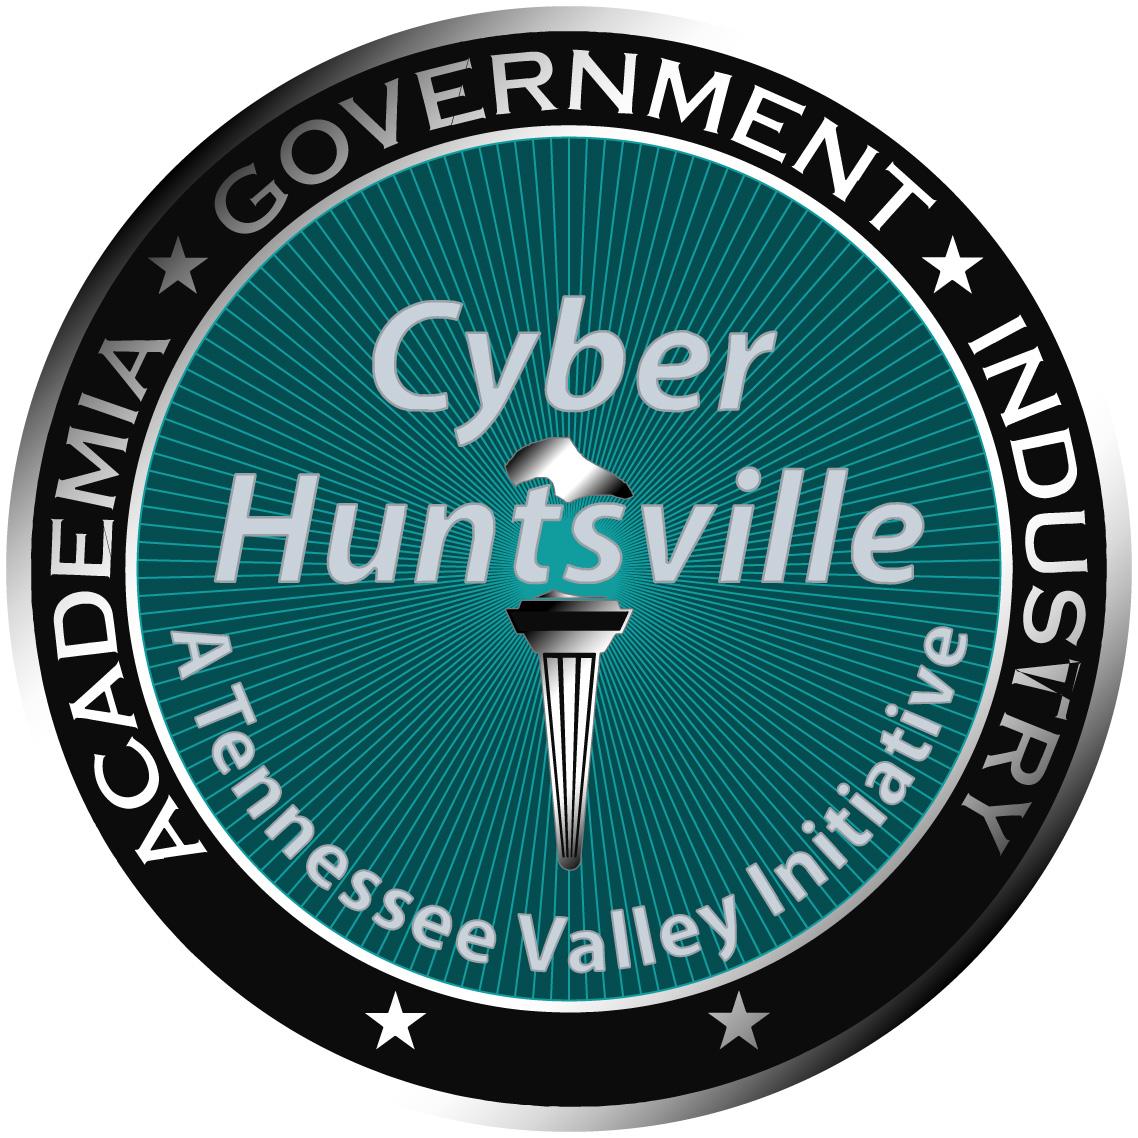 Cyber Huntsville